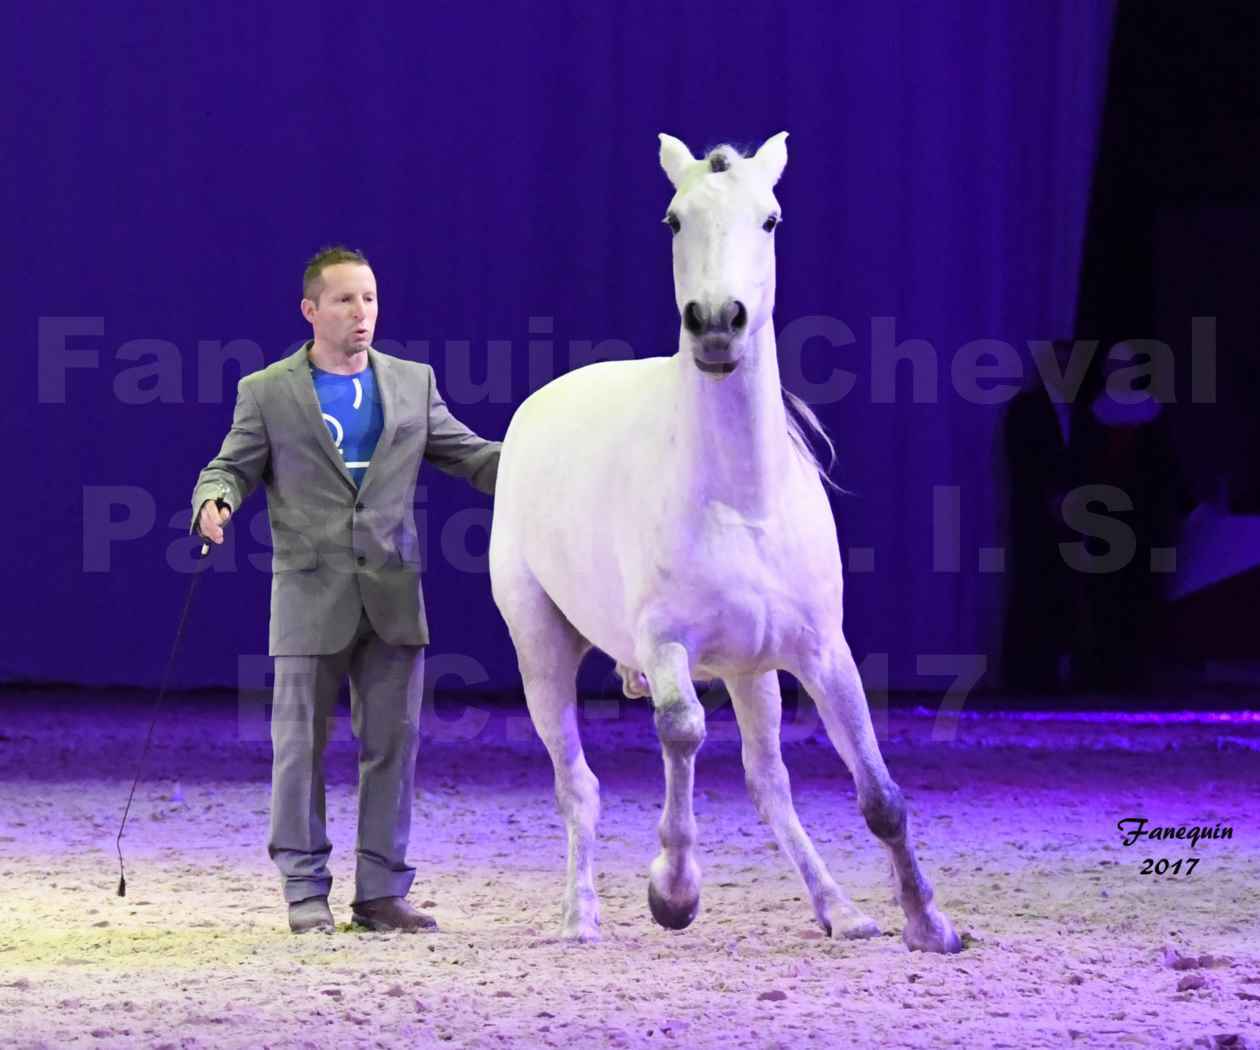 Cheval Passion 2017 - M. I. S. E. C. - Ludovic LONGO & 1 cheval en liberté - 07